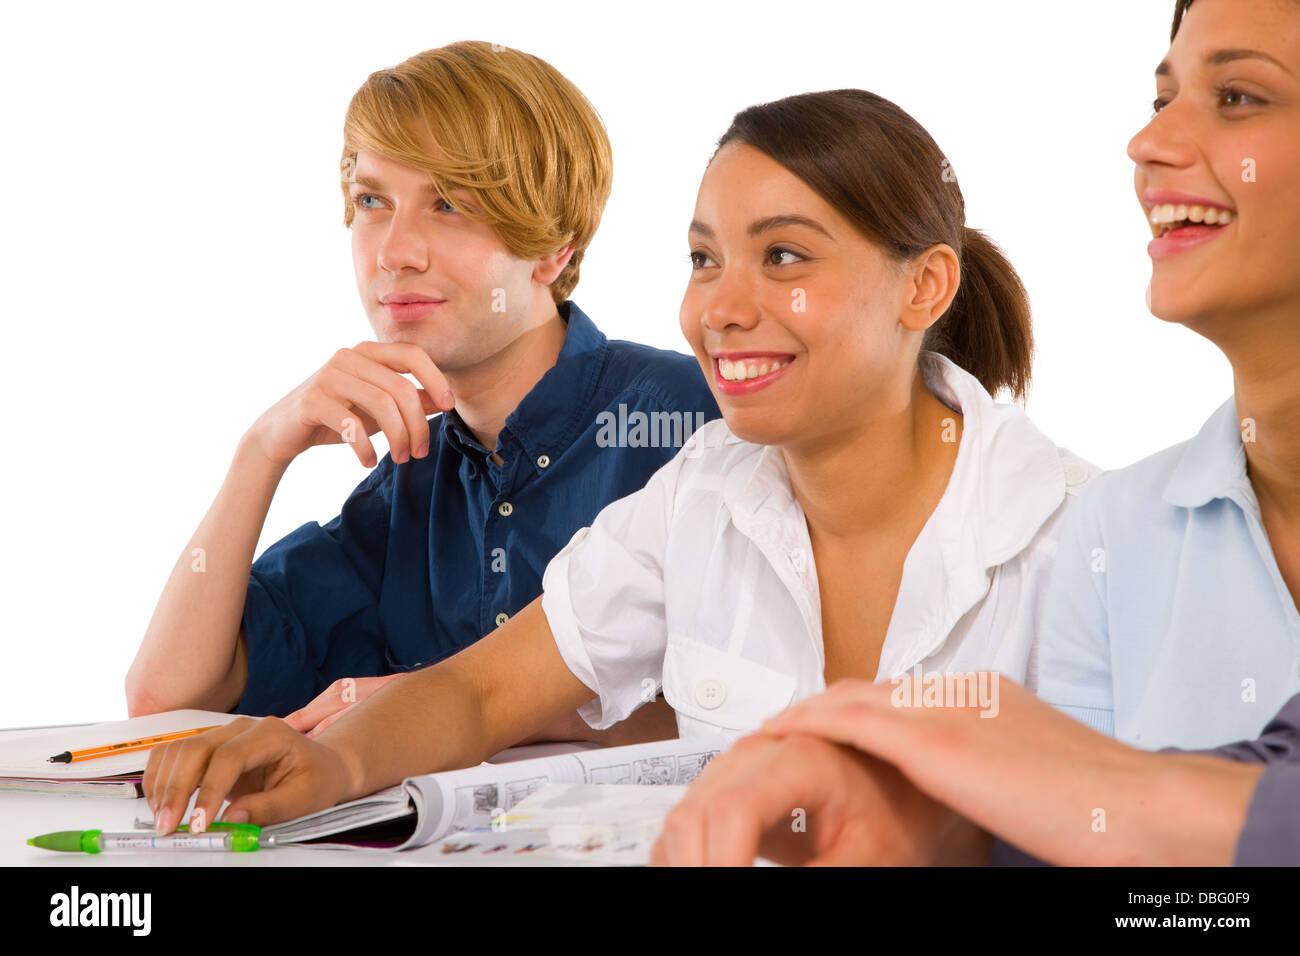 teenagers in classroom - Stock Image